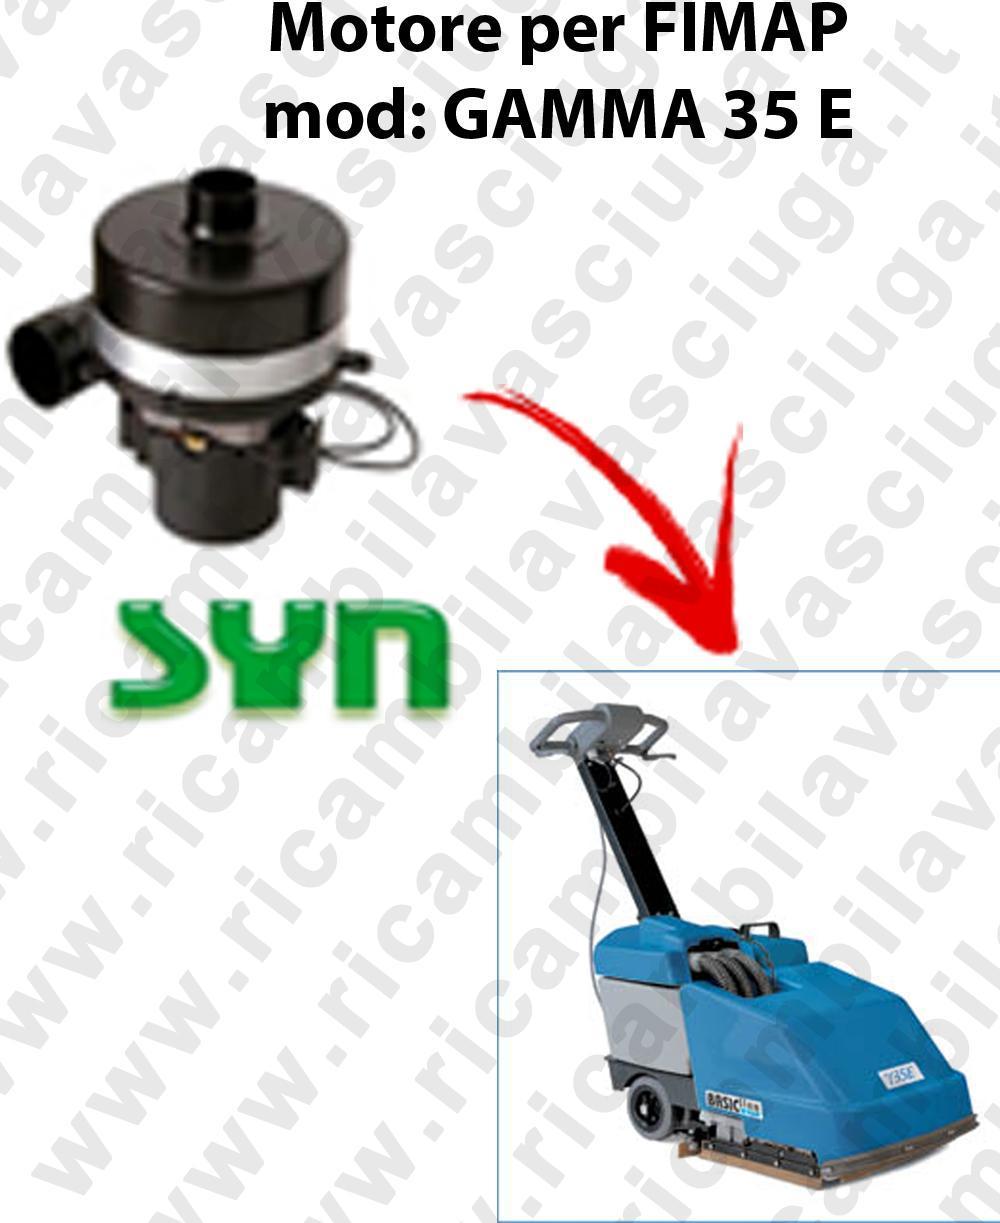 GAMMA 35 E MOTORE SYN aspirazione fregadoras Fimap